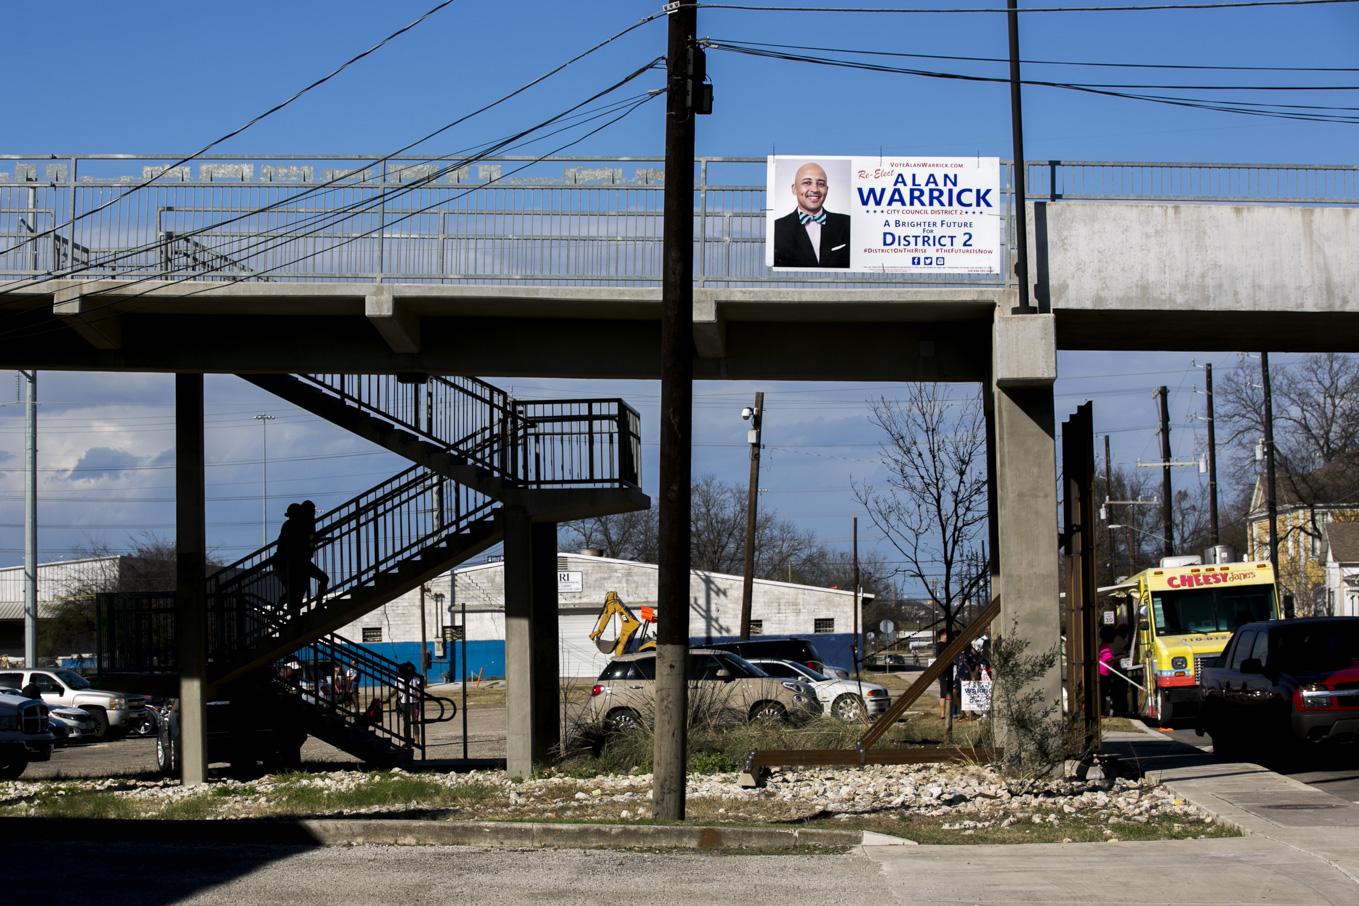 An Alan Warrick re-election sign hangs from Hays Street Bridge.